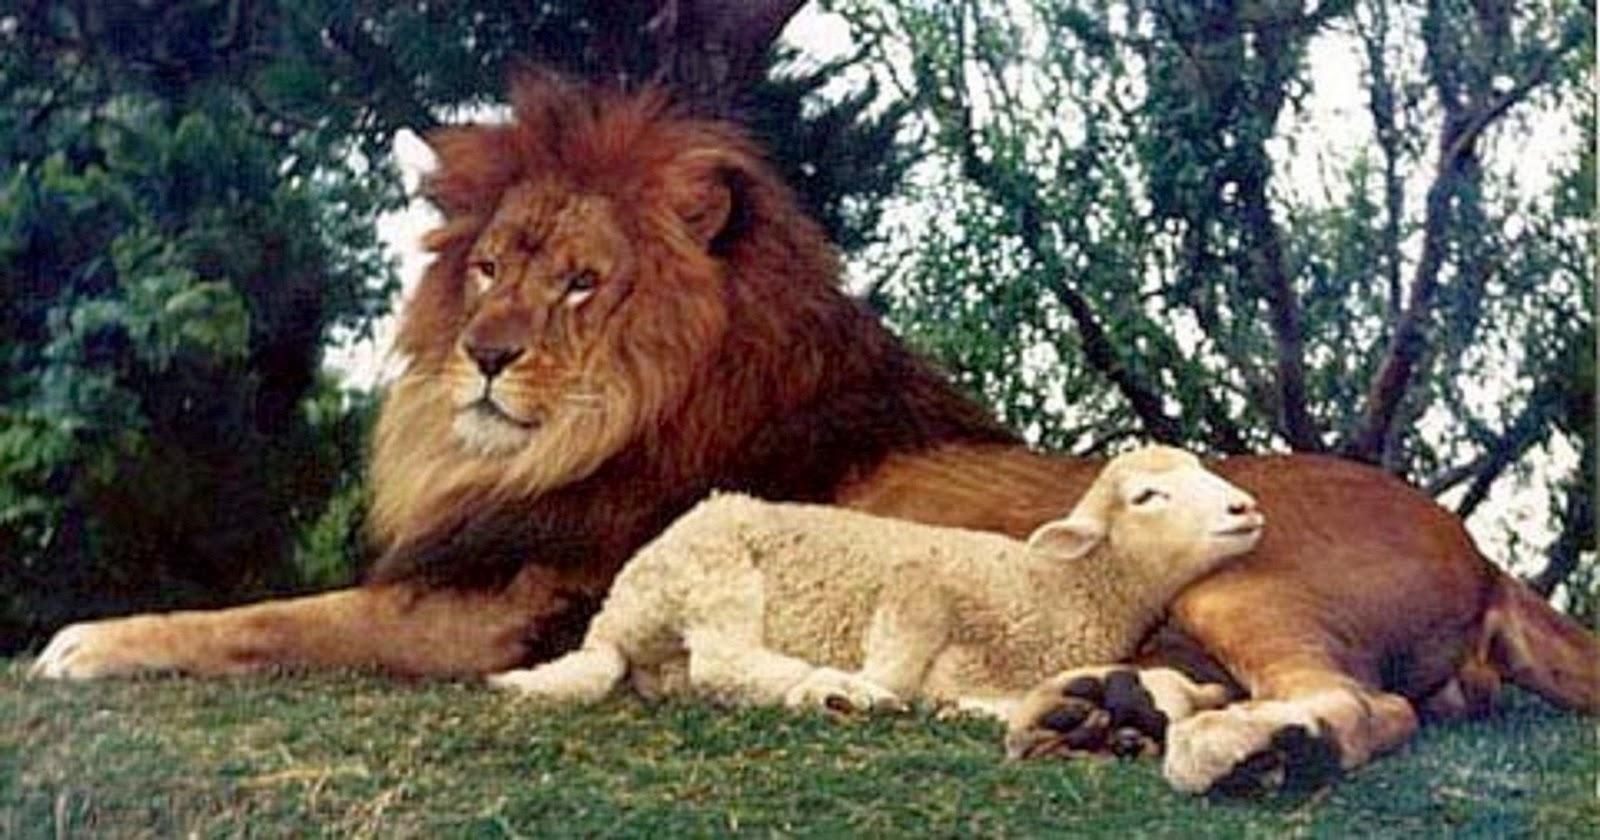 Lion nd the lamb